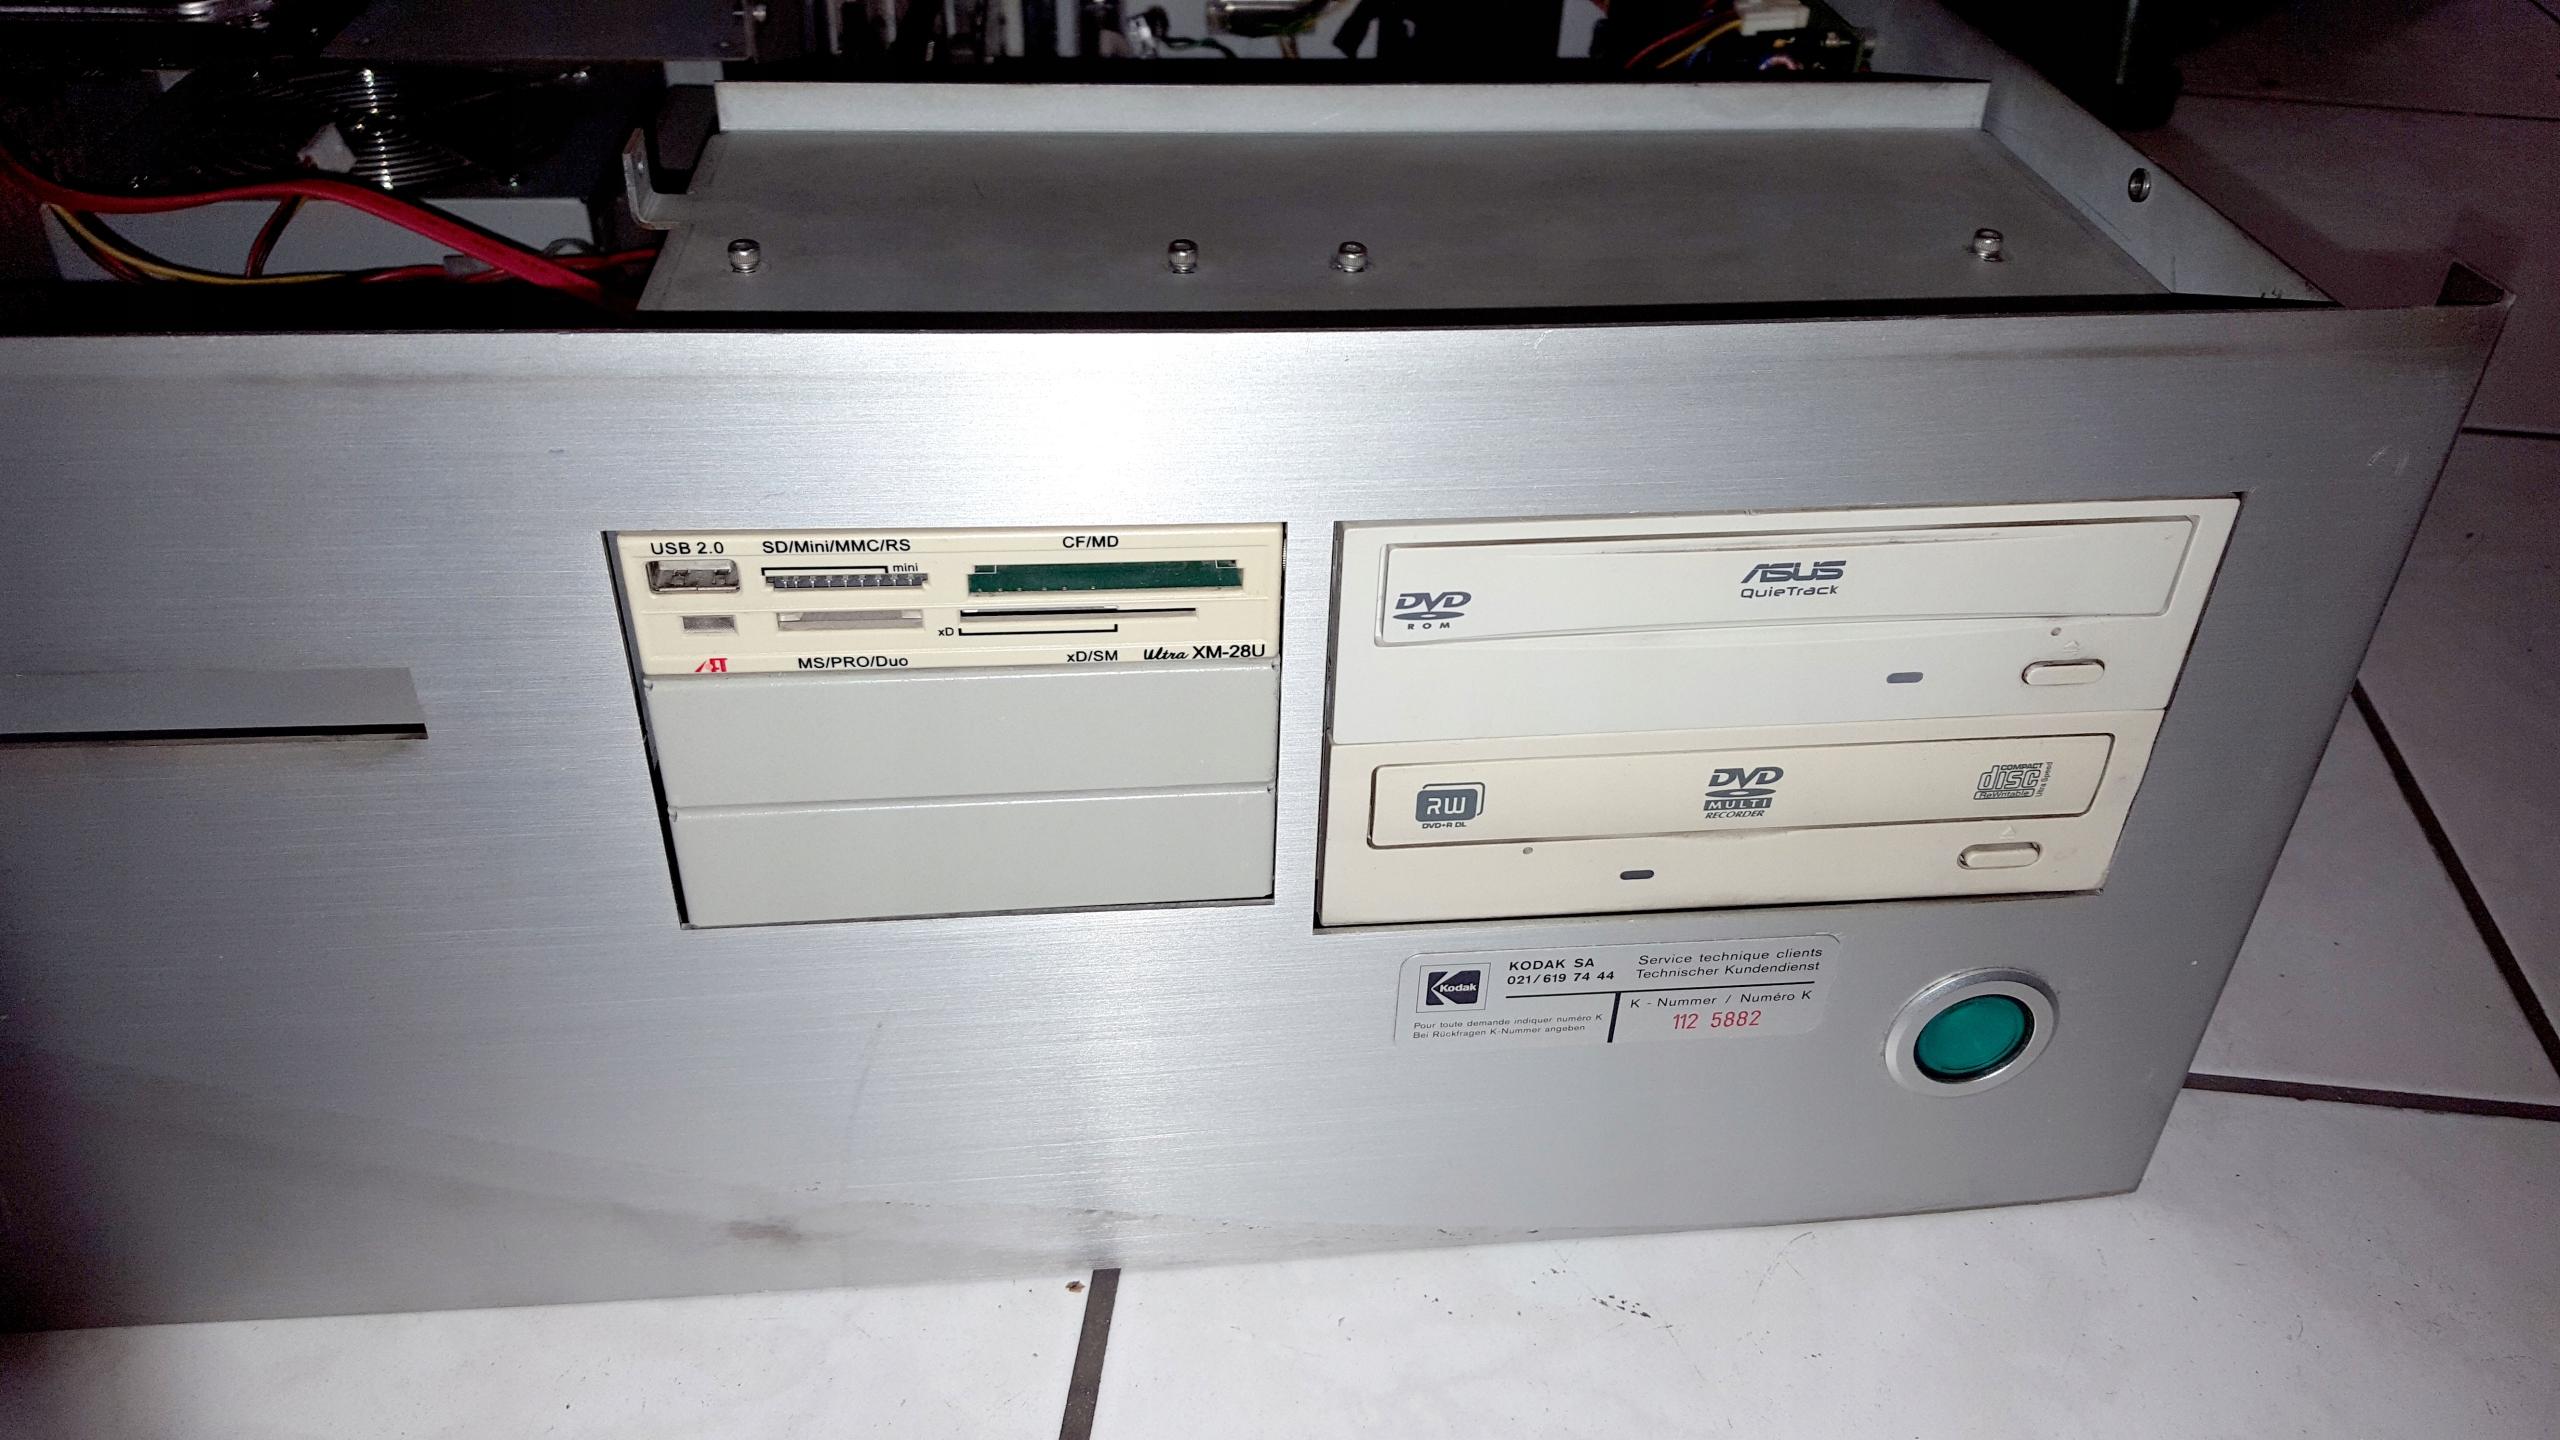 Gretag 1008 komputer